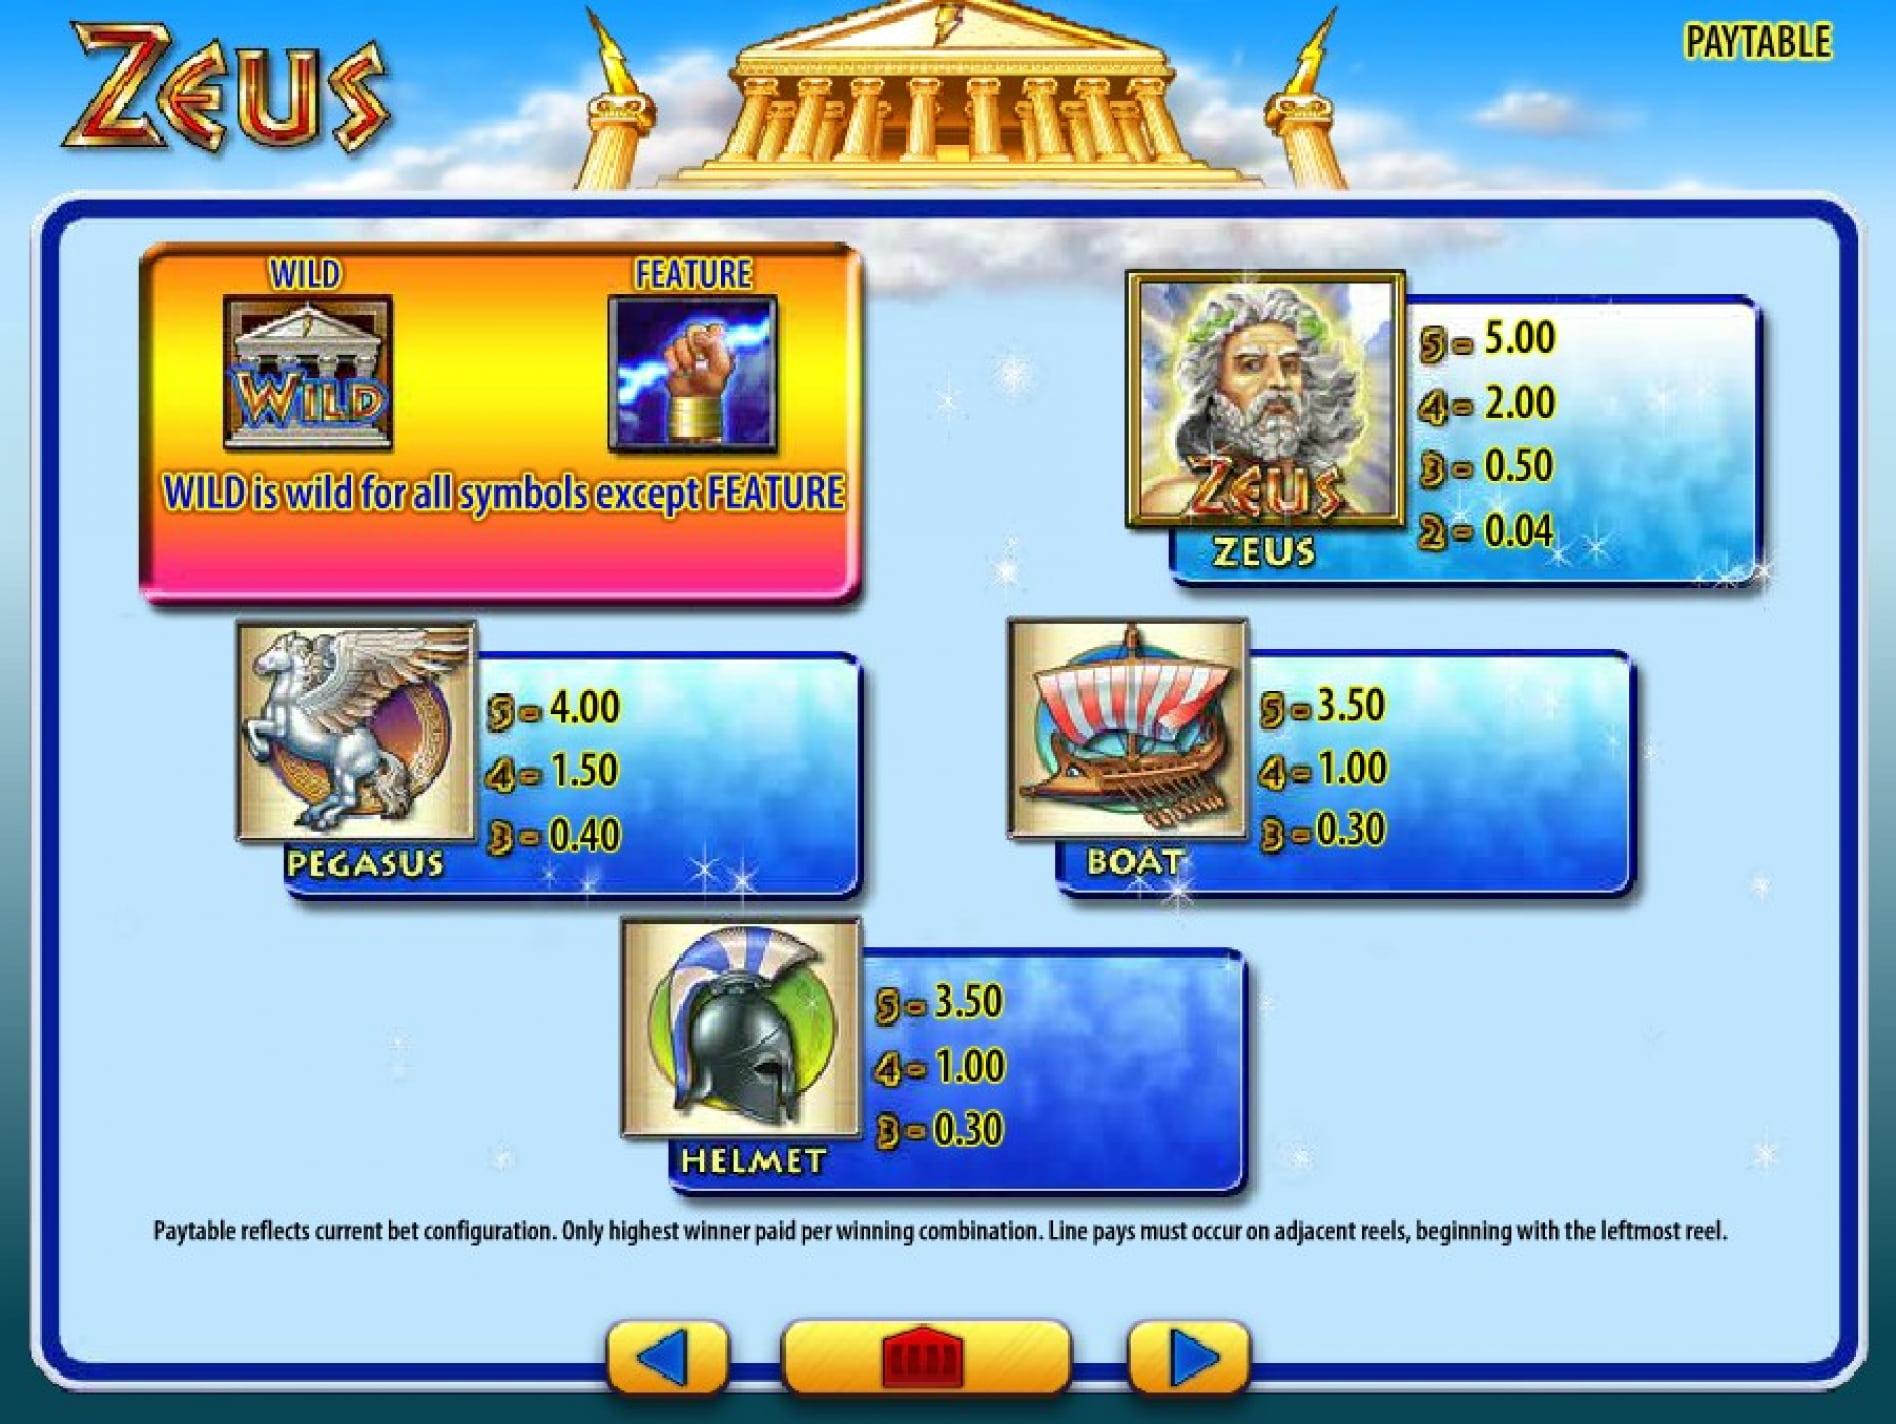 Zeus Slot Game Symbols and Winning Combinations